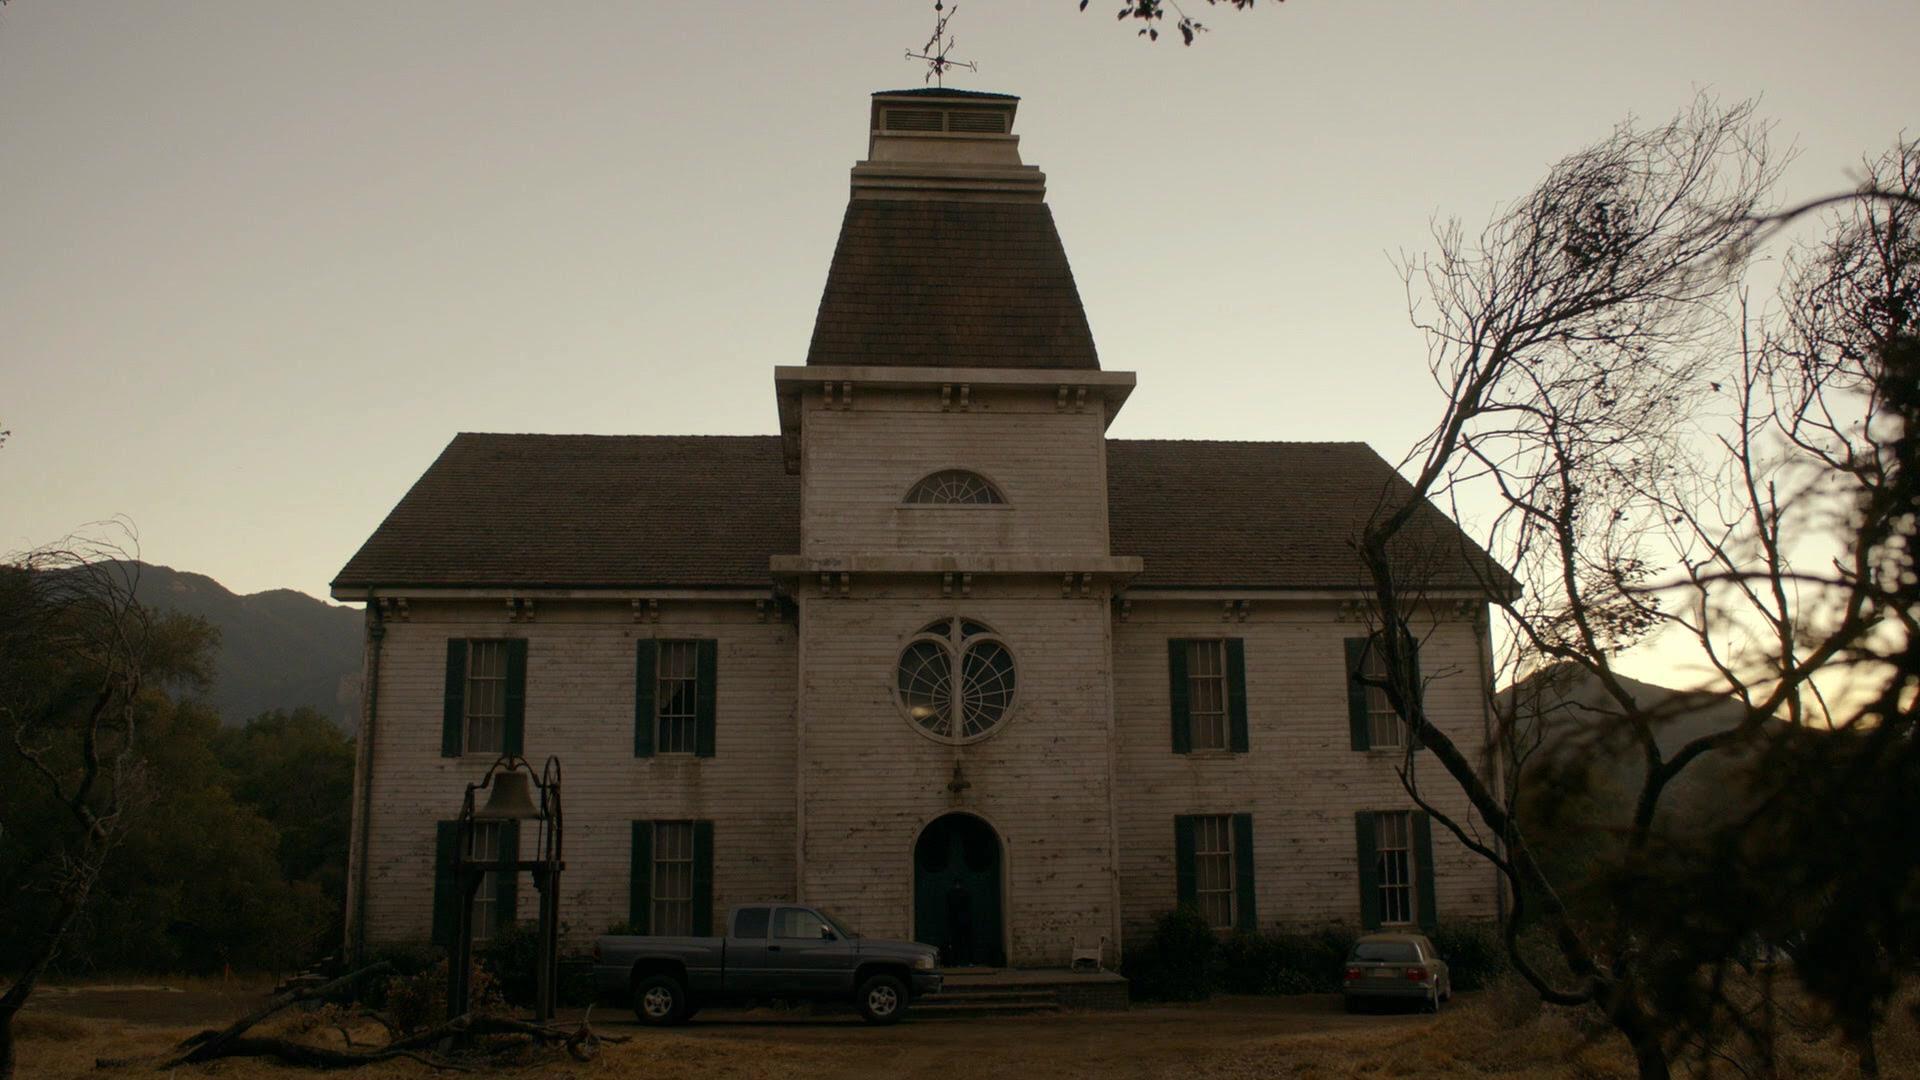 Resultado de imagem para american horror story Roanoke mansion